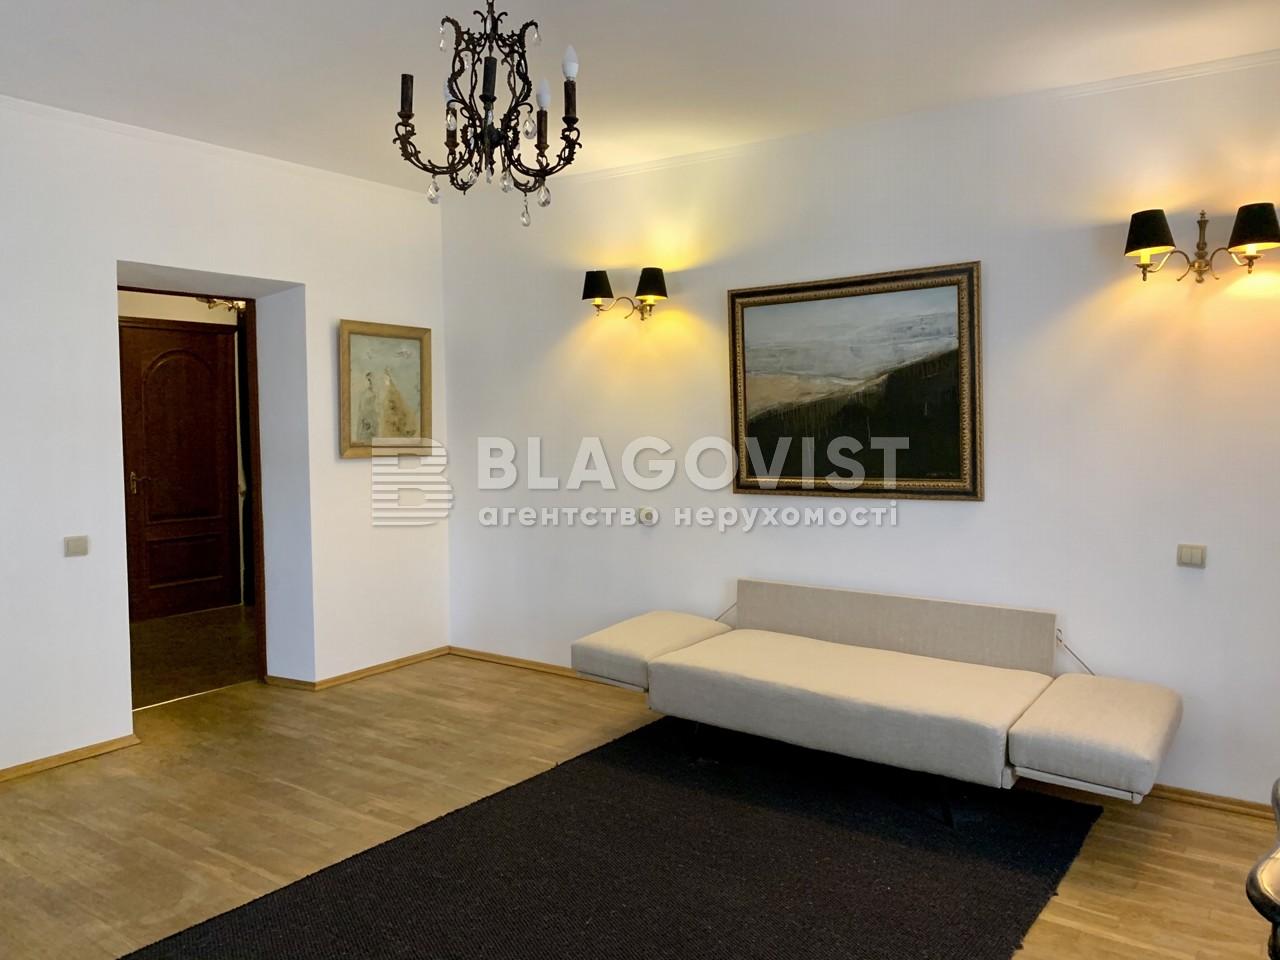 Квартира E-9552, Хмельницкого Богдана, 62б, Киев - Фото 3